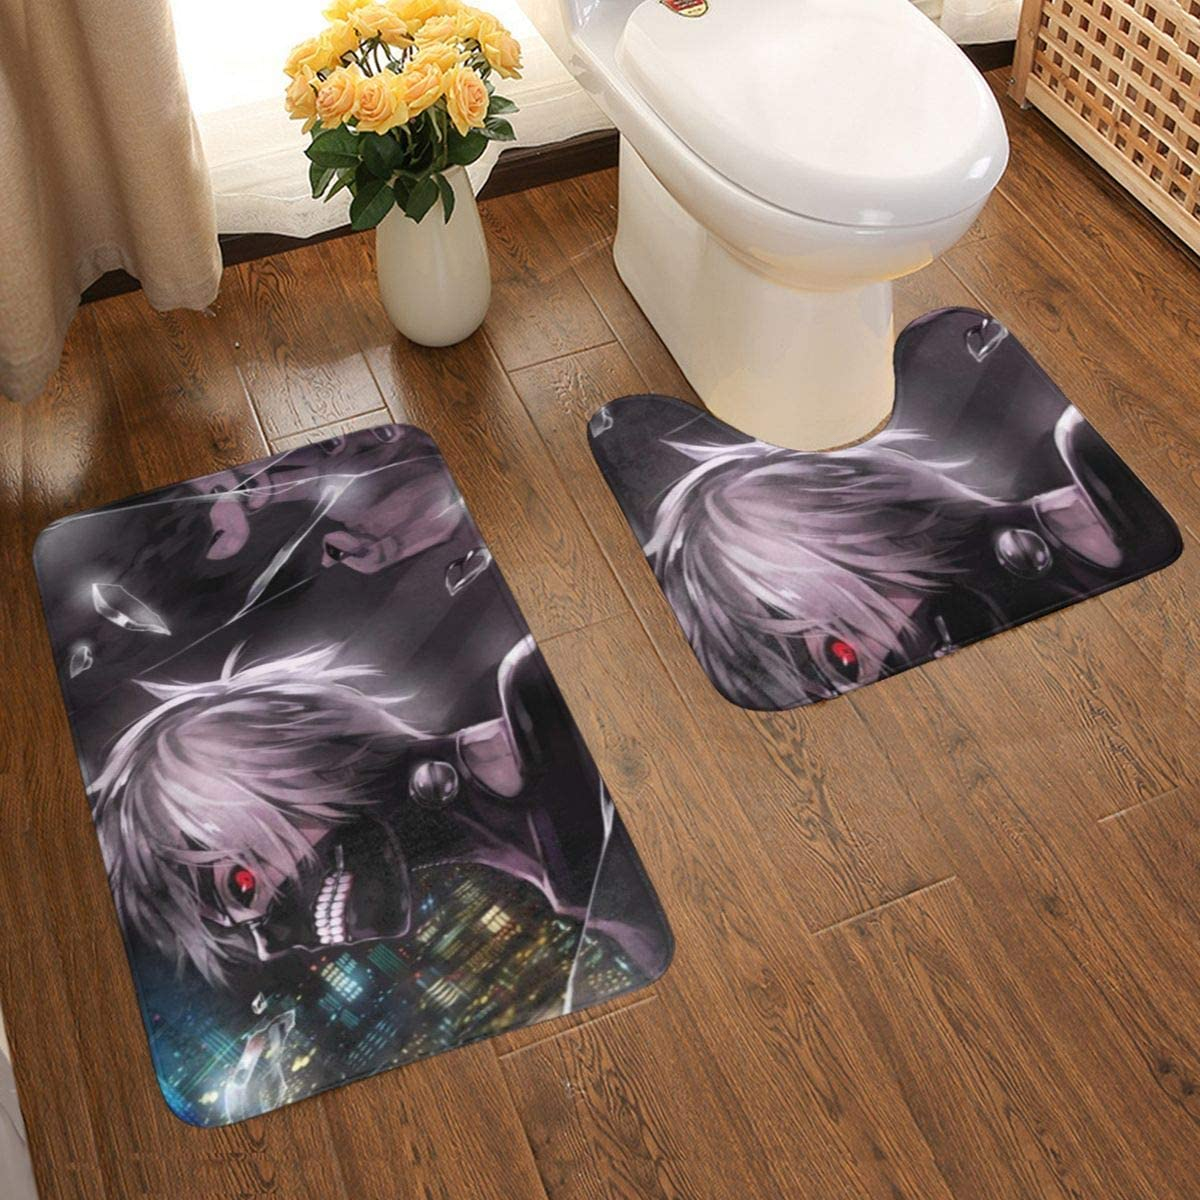 Tokyo Ghoul Bathroom Antiskid pad Soft Bath Rug Set Anti-Skid Bath Mat + U-Shaped Contour Bathroom Rug Mats Set 2 Piece